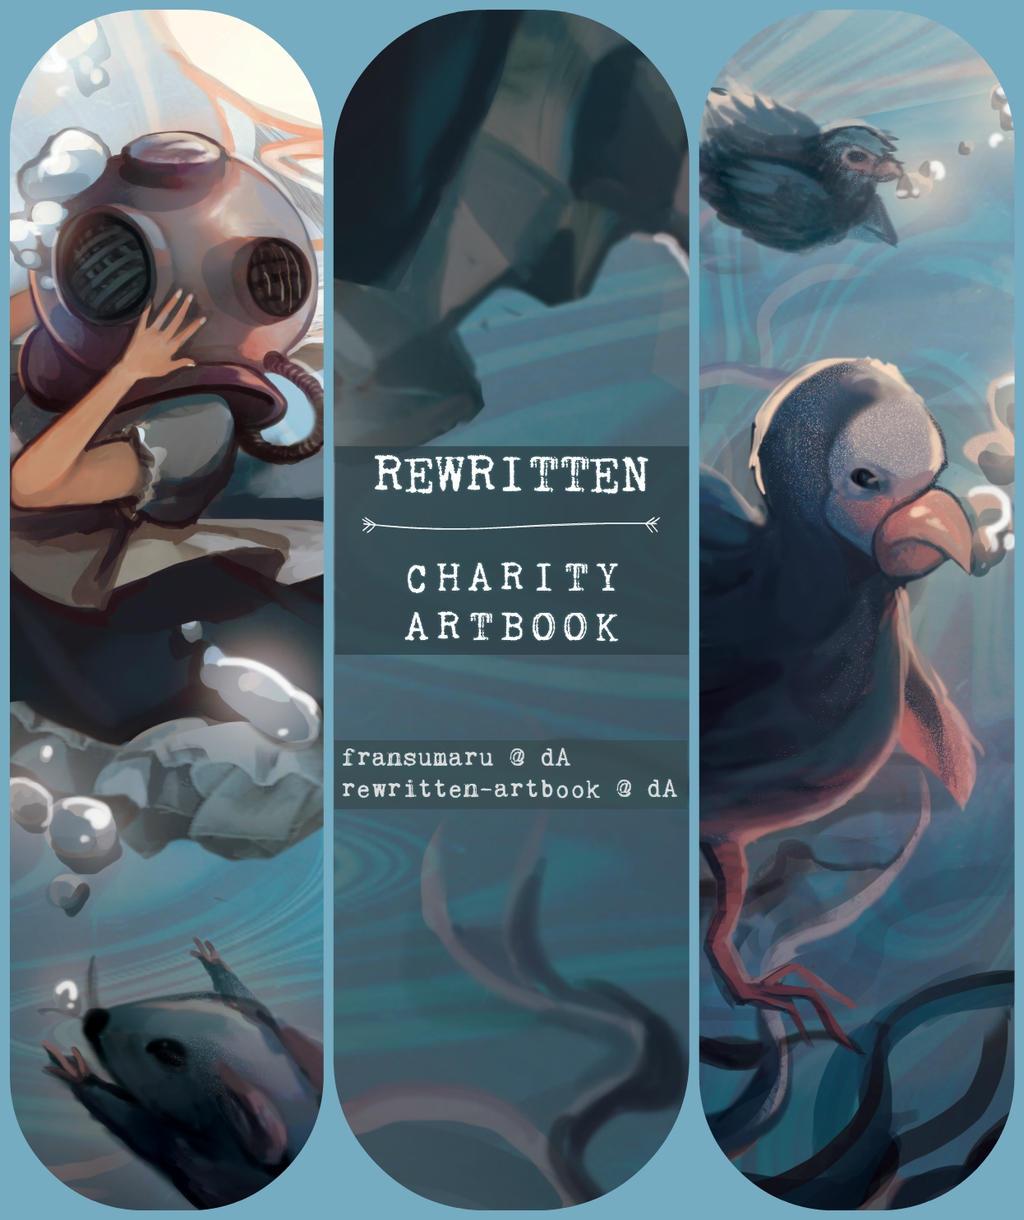 Rewritten AB Preview by Fransumaru